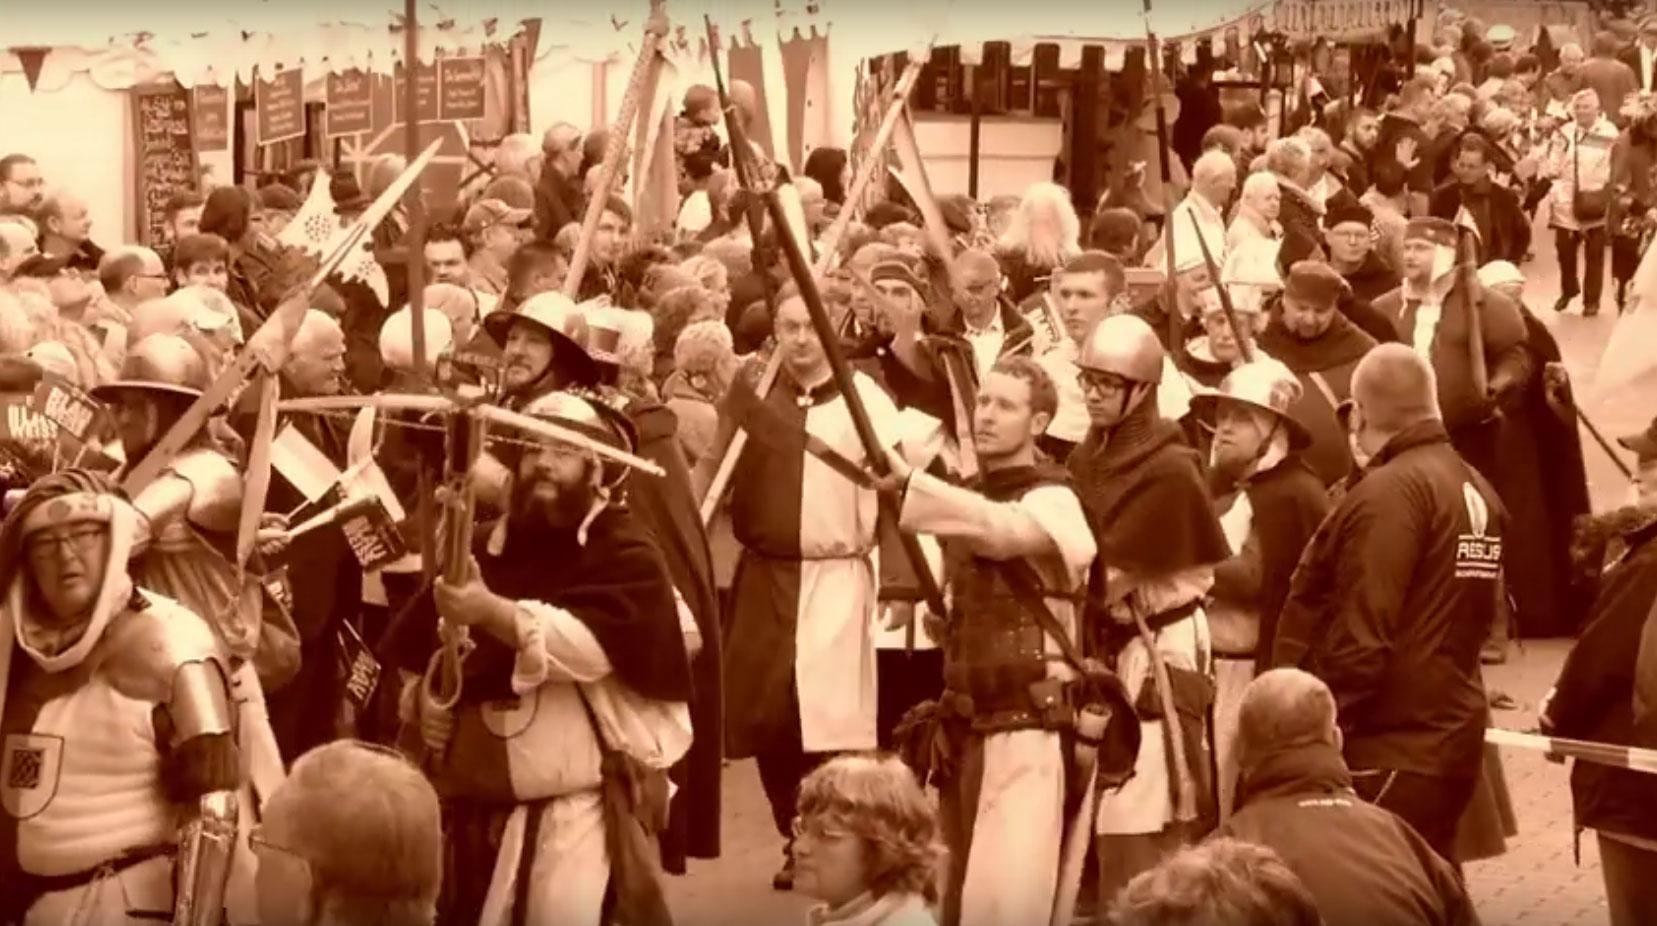 631. Bochumer Maiabendfest